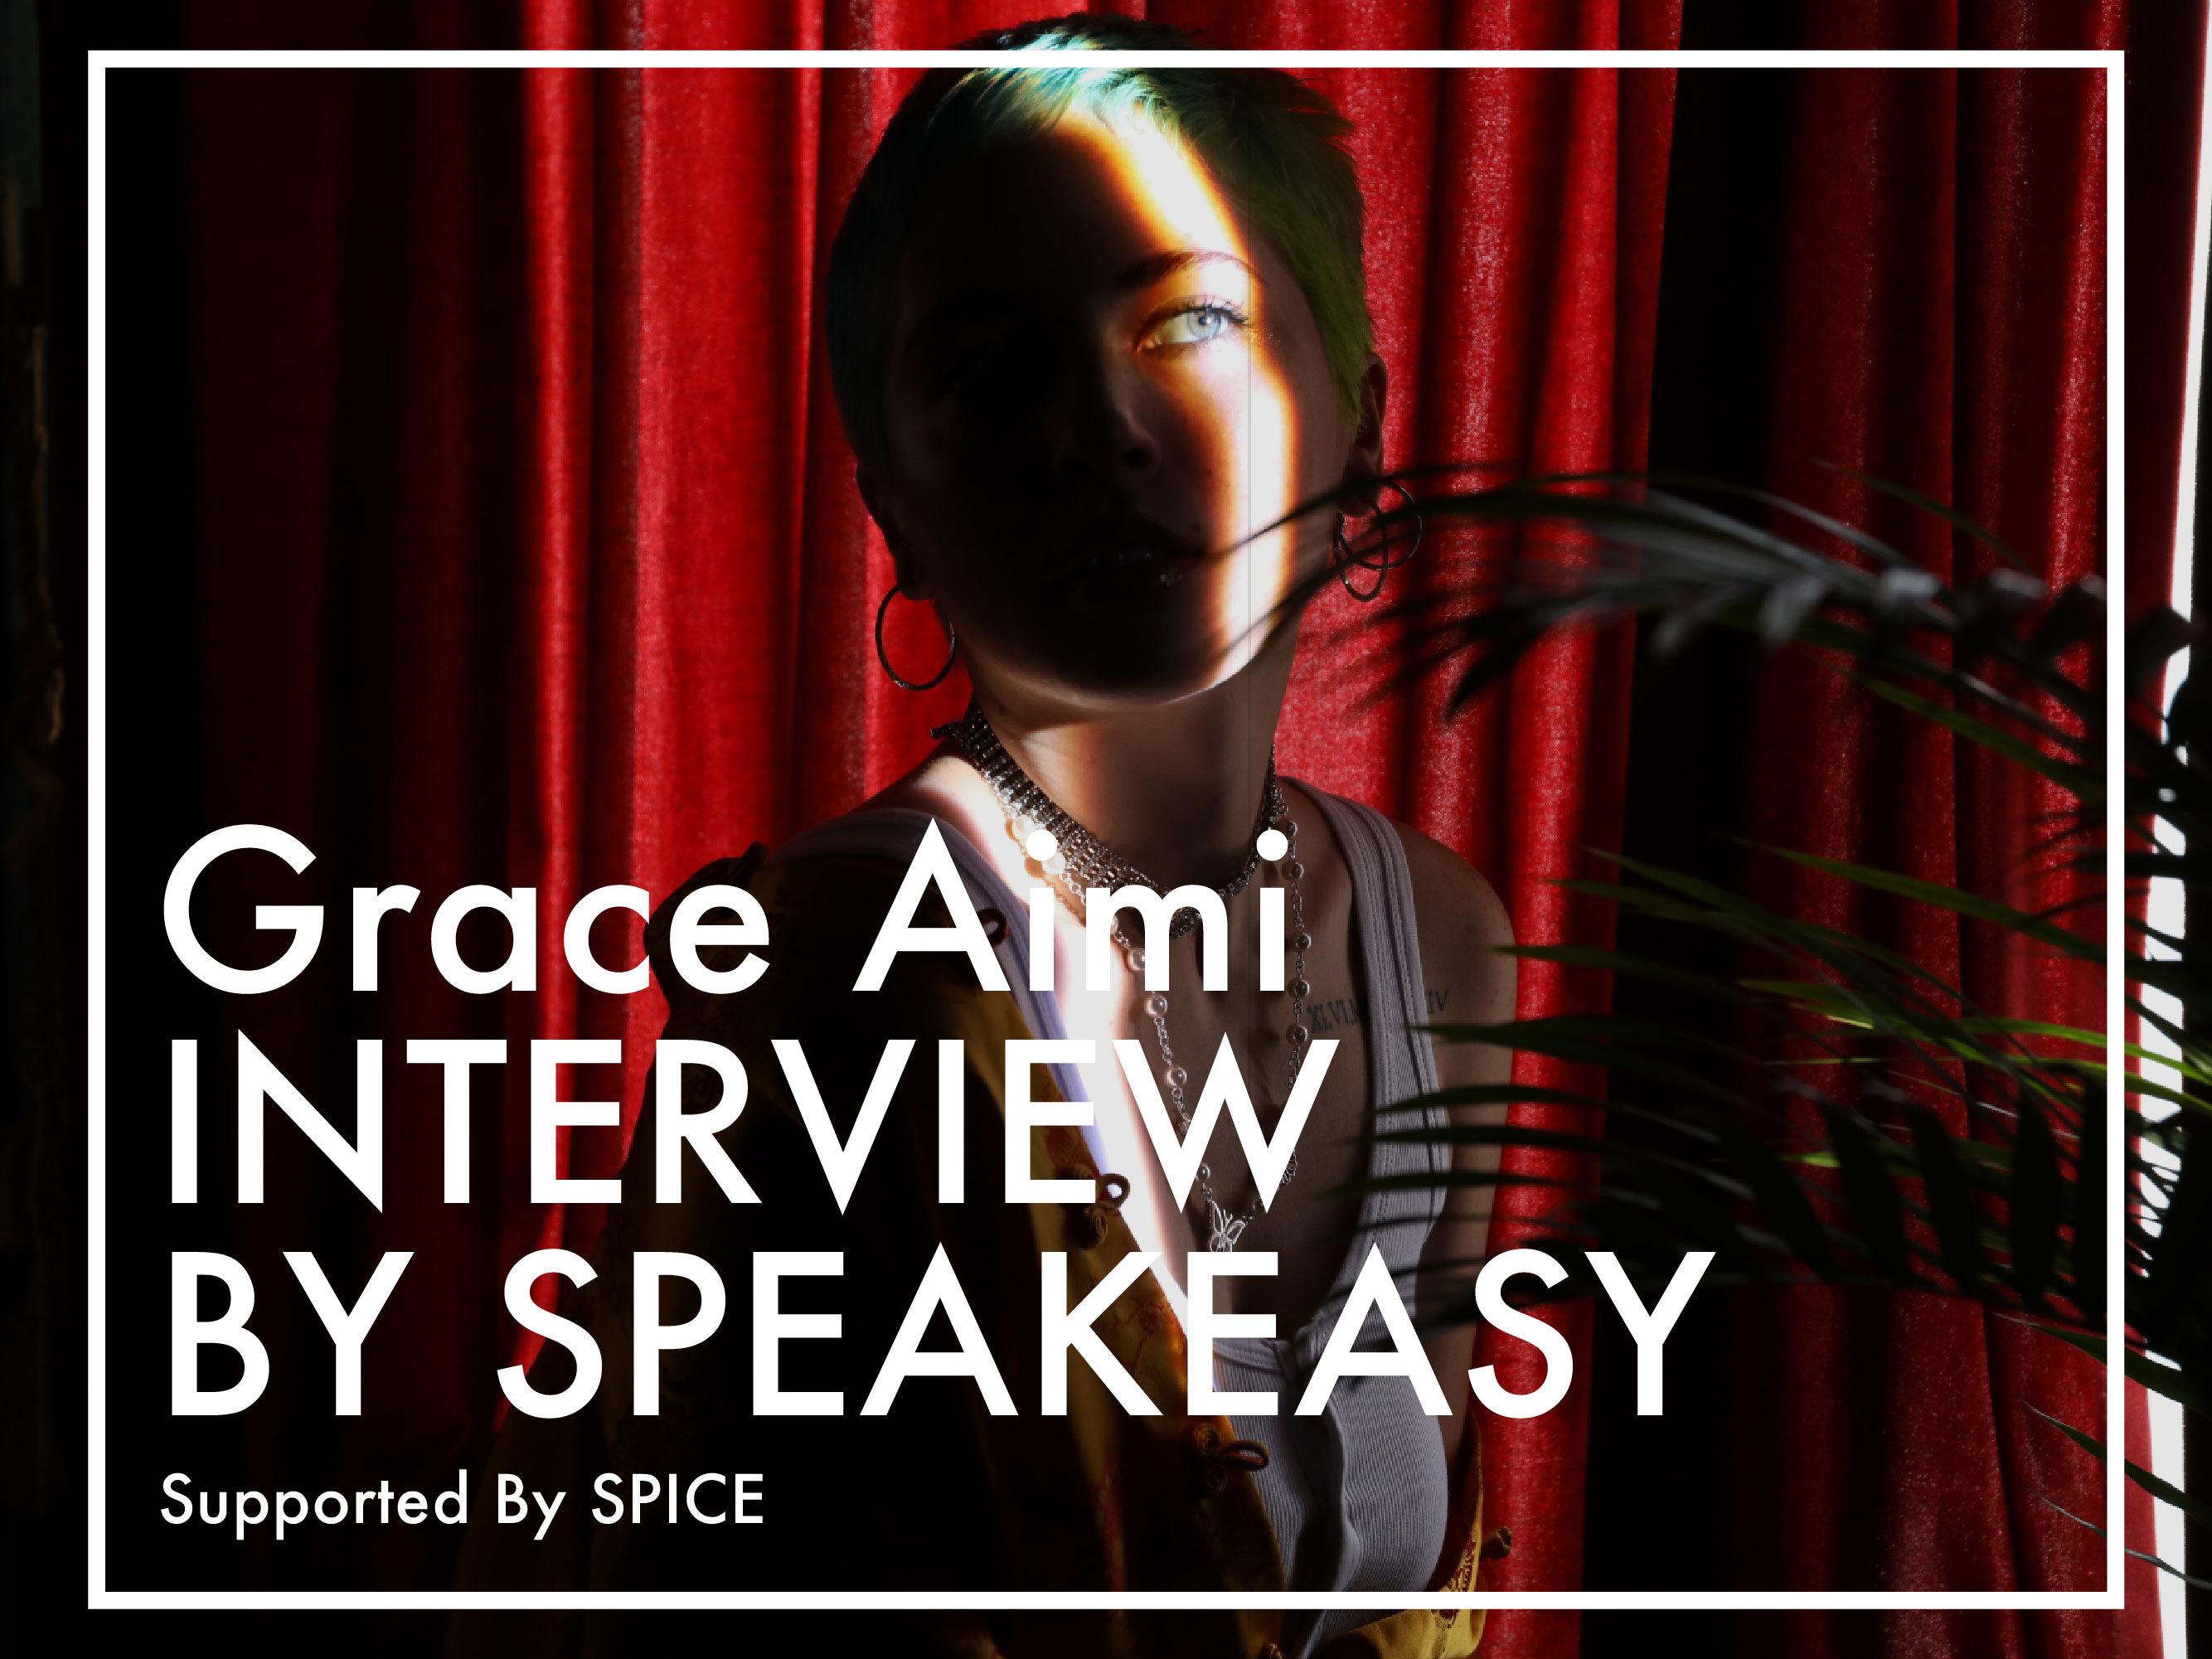 Grace Aimi